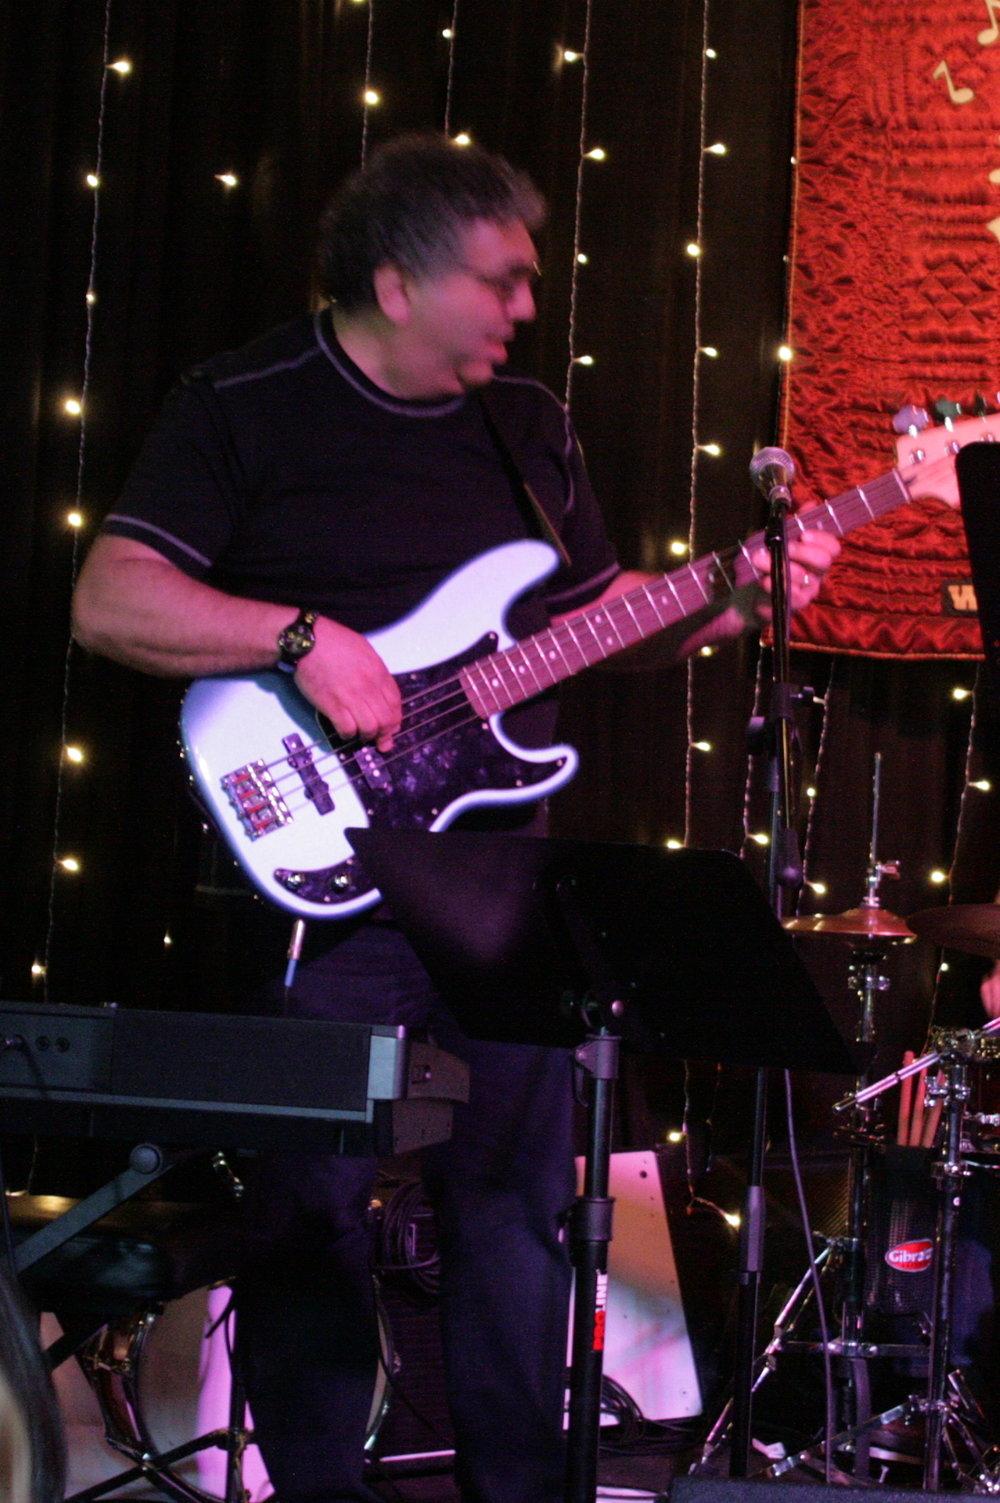 Hal playing at the 2017 Recital at Crossroads in Garwood. NJ